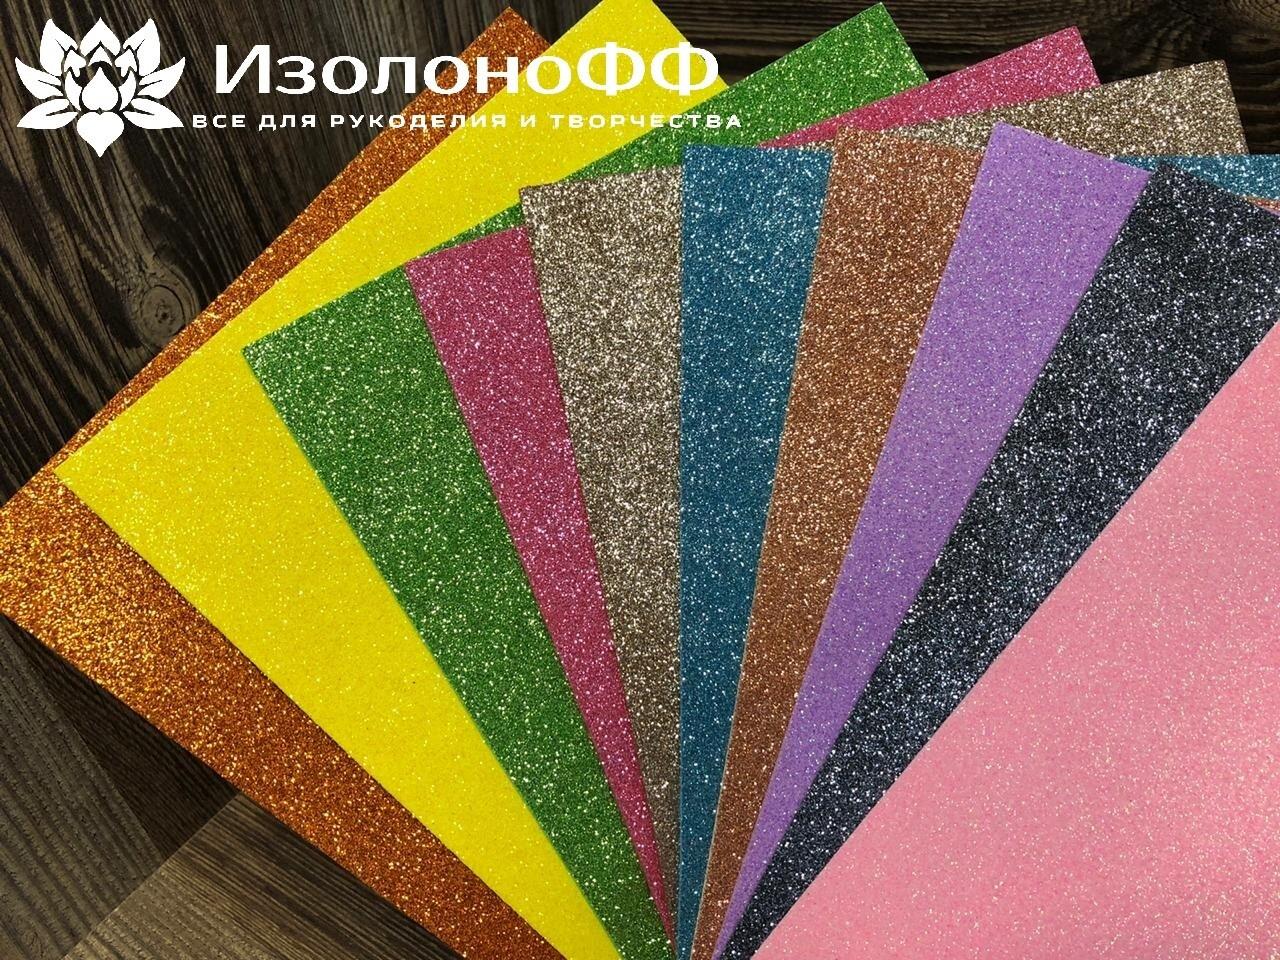 Набор: фоамиран глиттерный 2мм 20х30см №011 (10 листов)